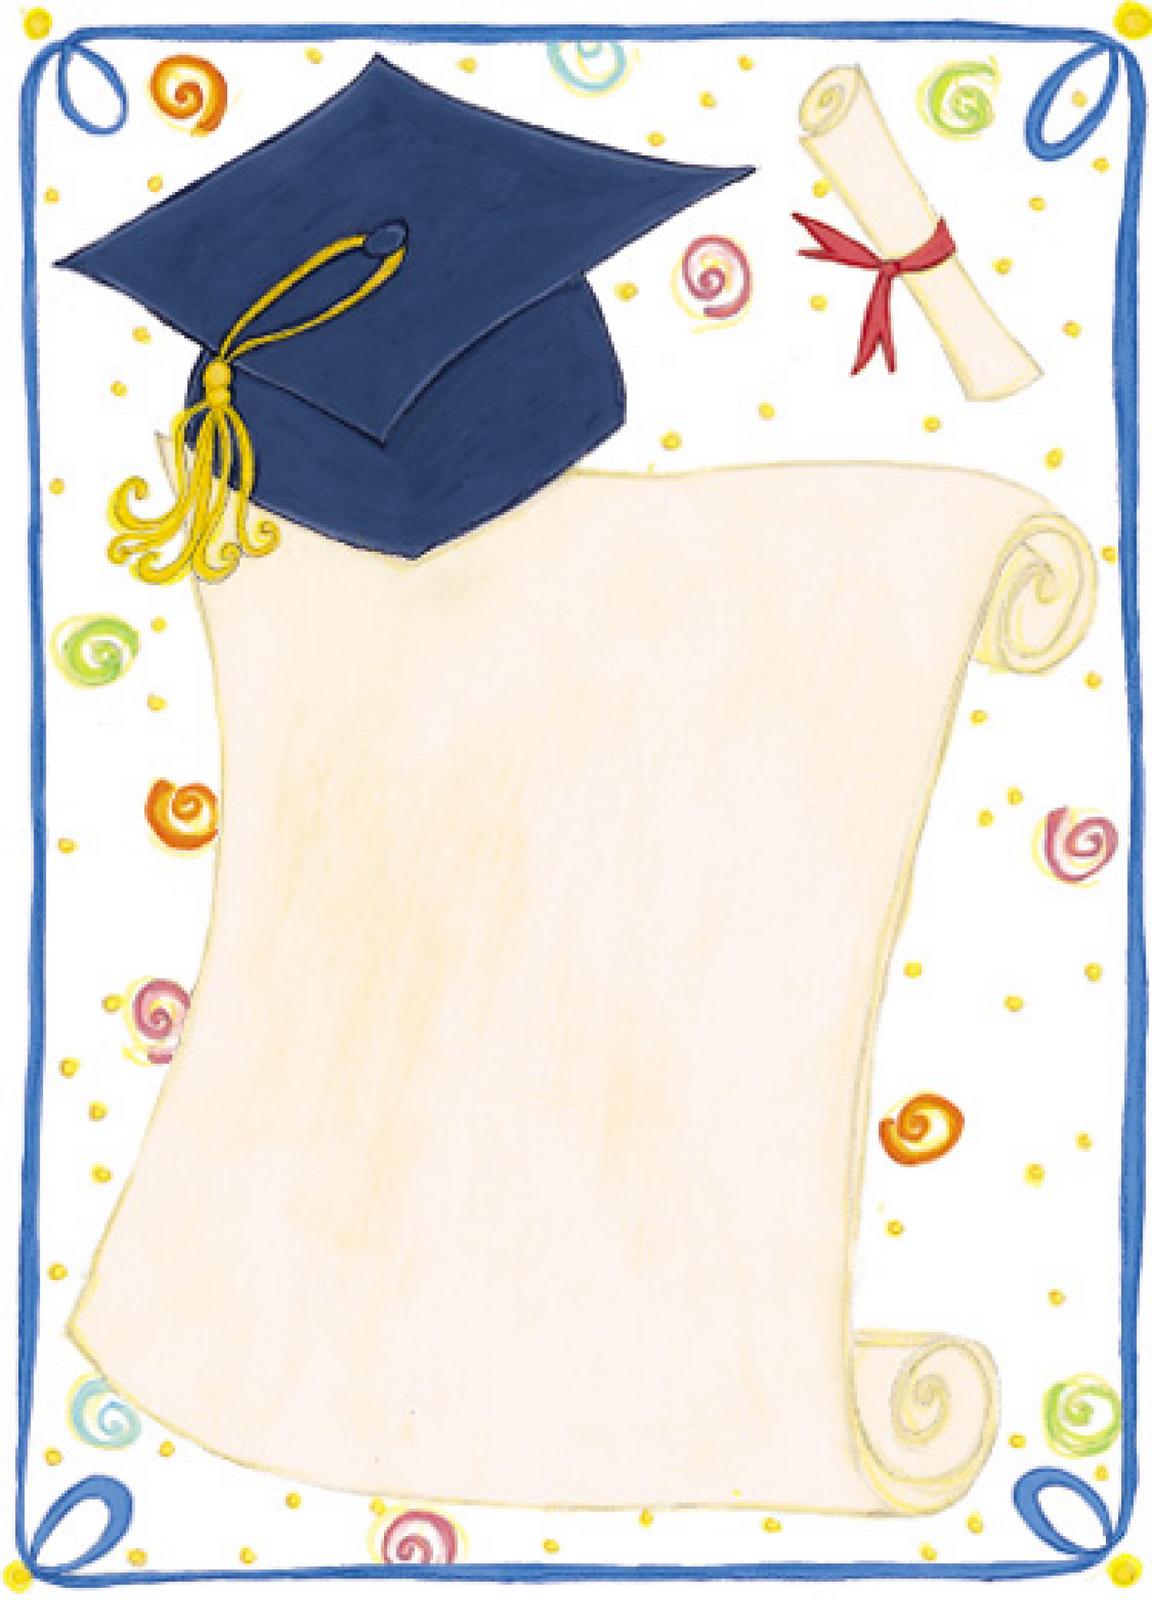 Fondos para fotos de graduación de preescolar - Imagui